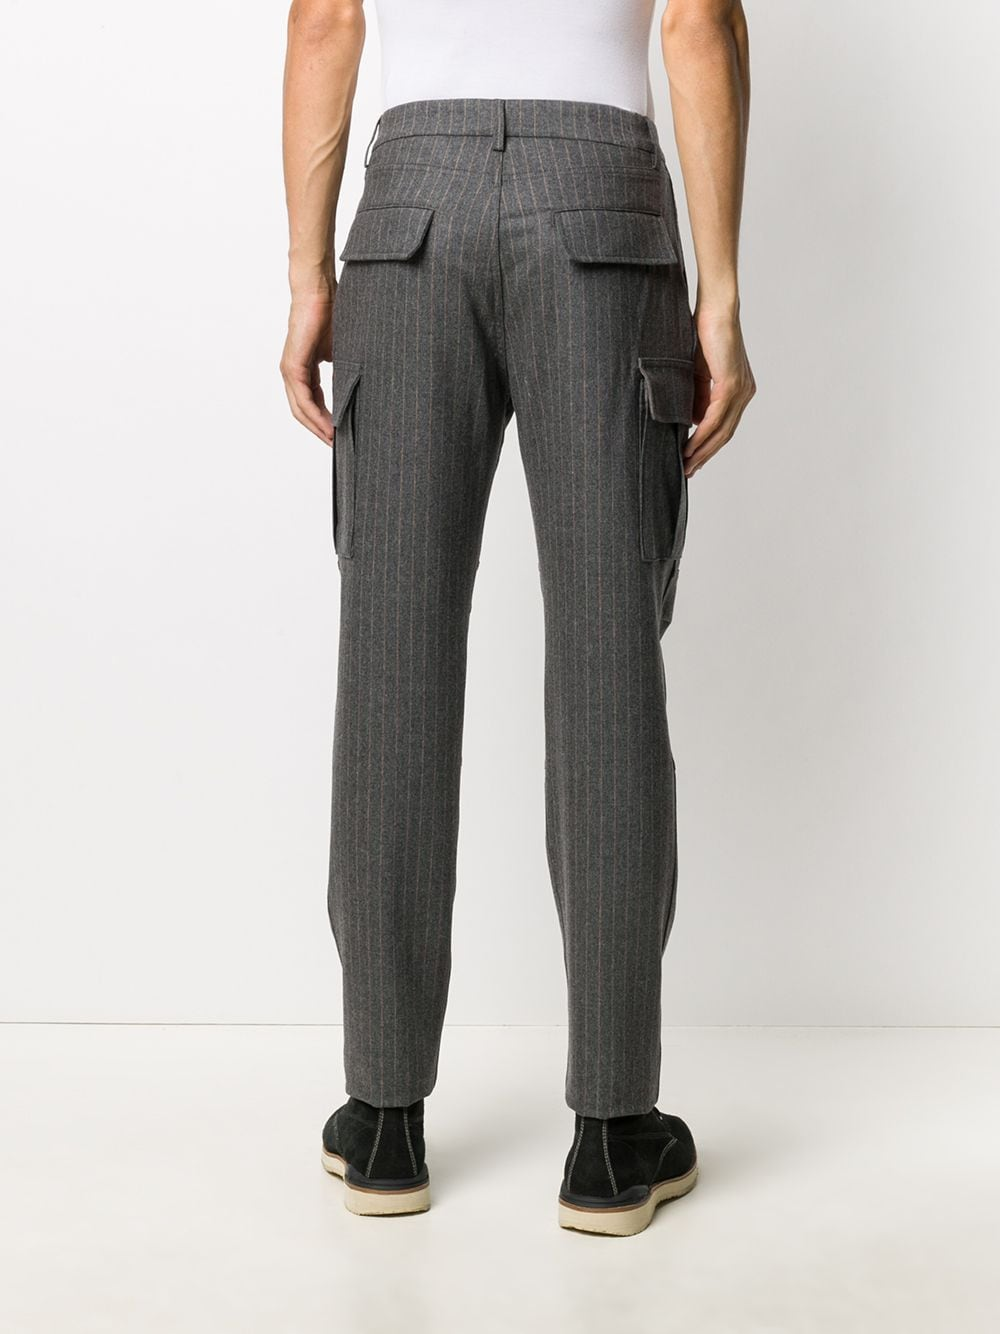 Pantaloni grigi in maglia a righe verticali in misto lana-cashmere ELEVENTY | Pantaloni | B75PANA15-TES0B03714